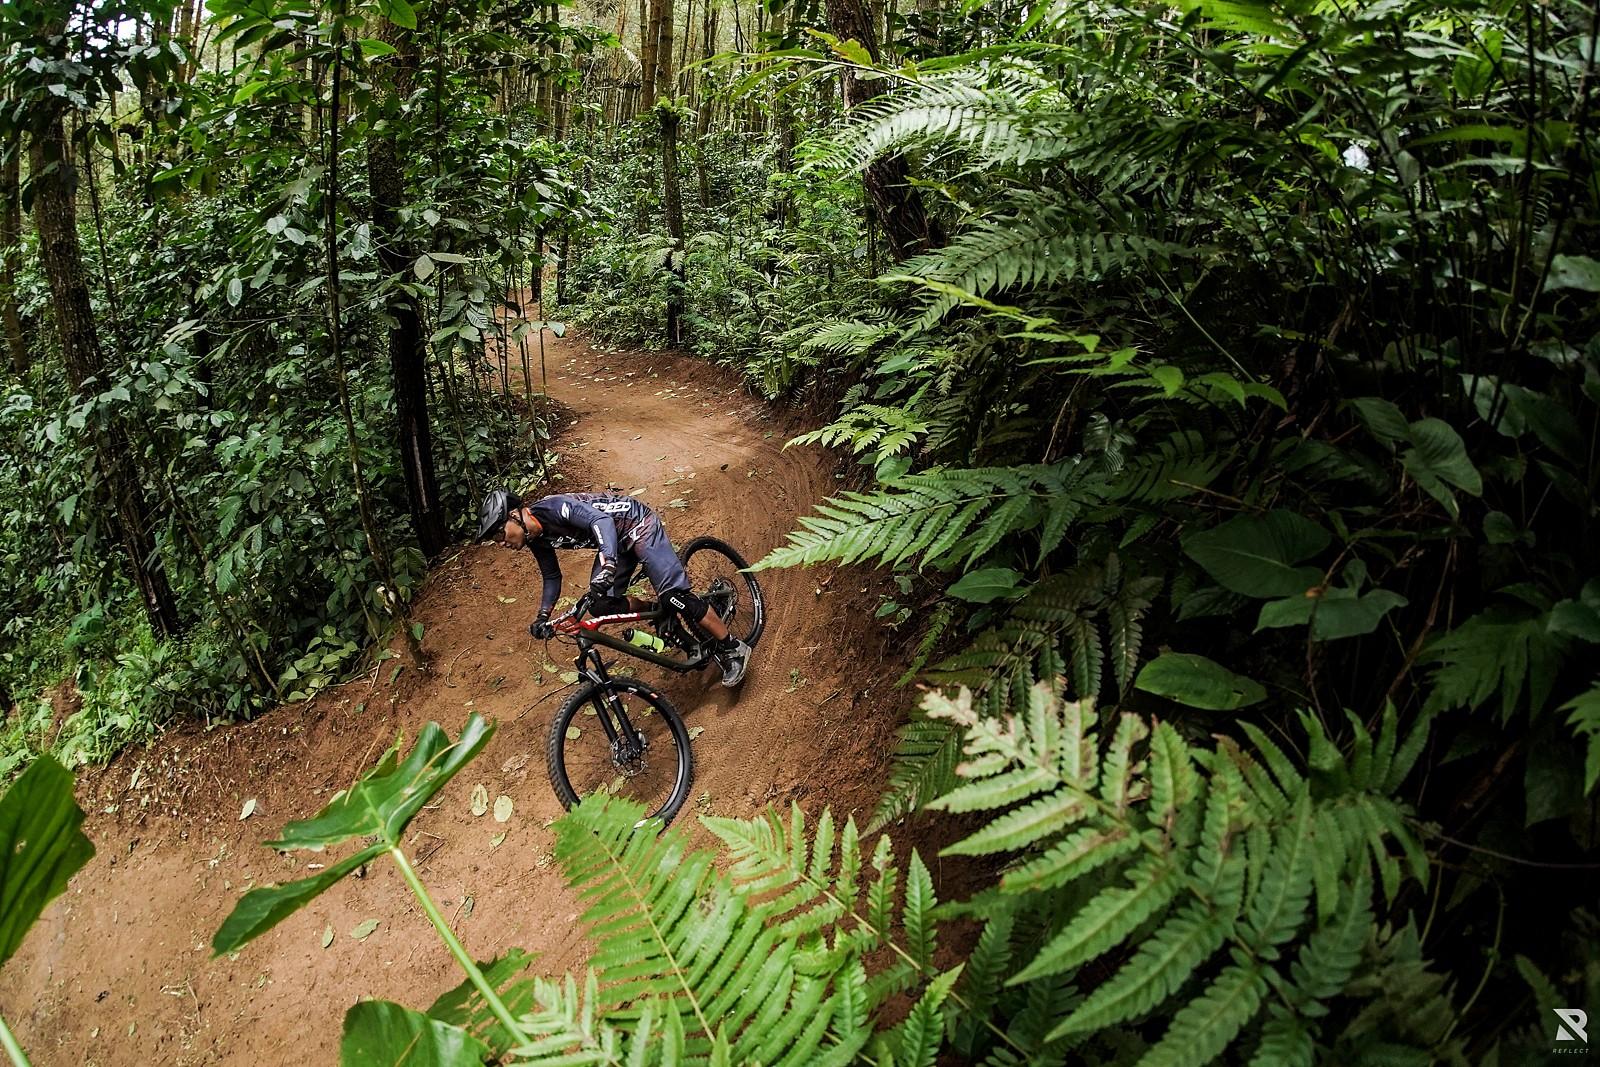 Into the woods - RezaAkhmad - Mountain Biking Pictures - Vital MTB